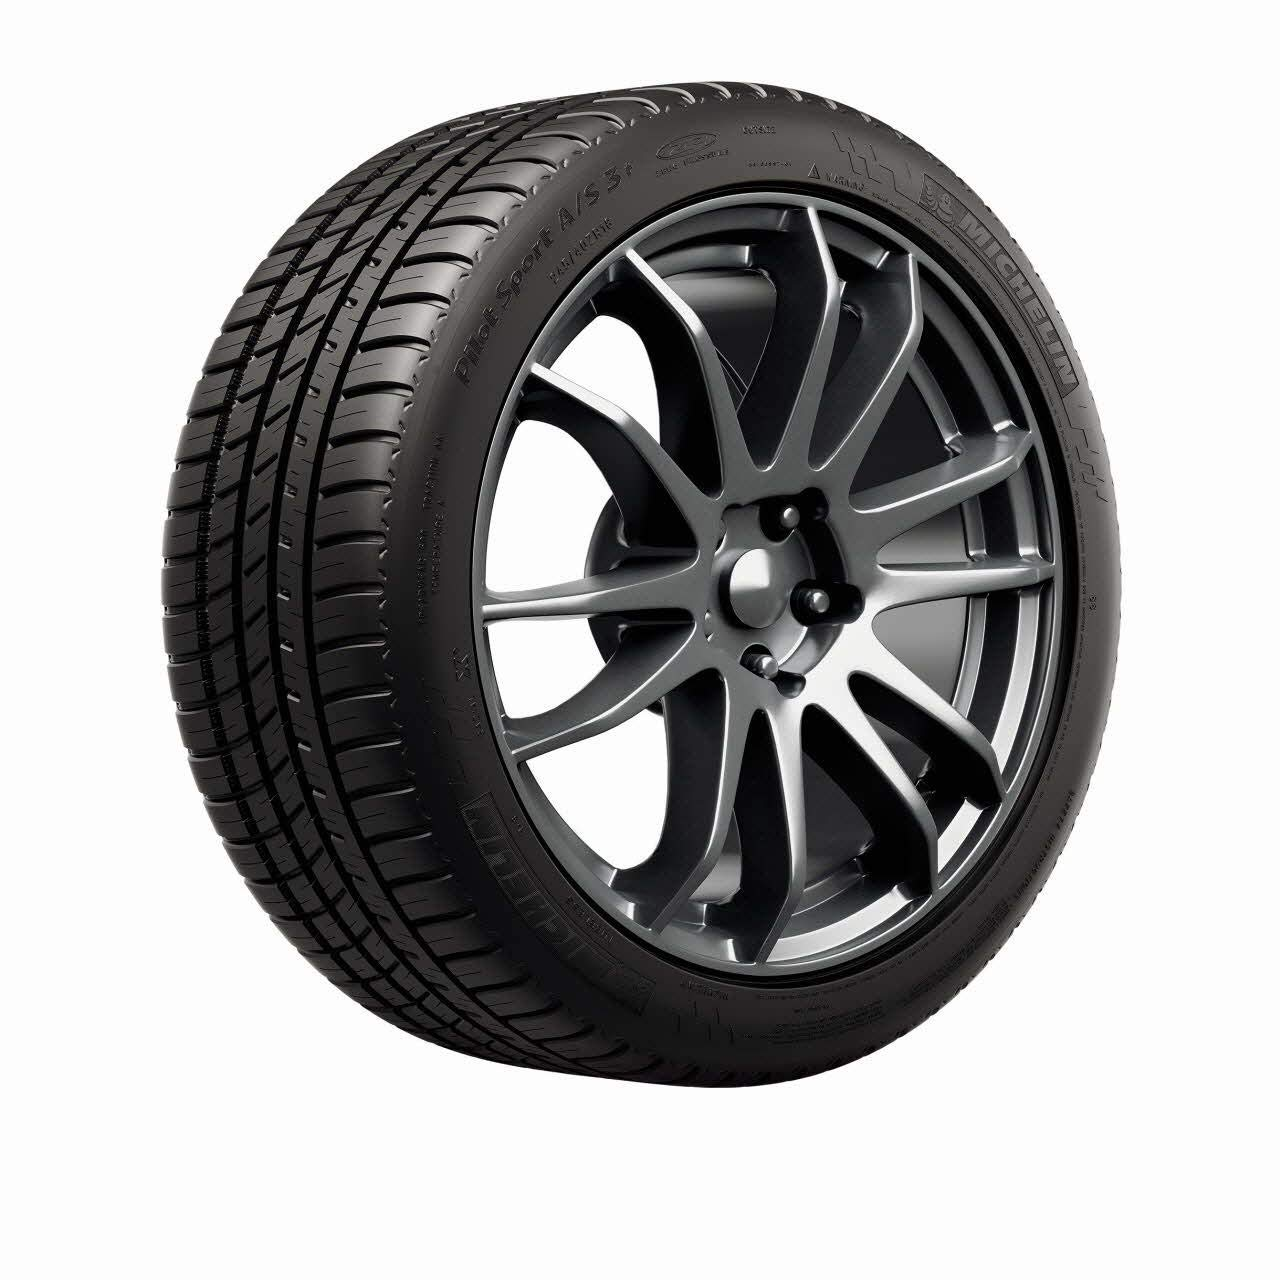 Michelin Pilot Sport >> Michelin Pilot Sport A S 3 All Season Performance Radial Tire 225 45zr17 Xl 94y